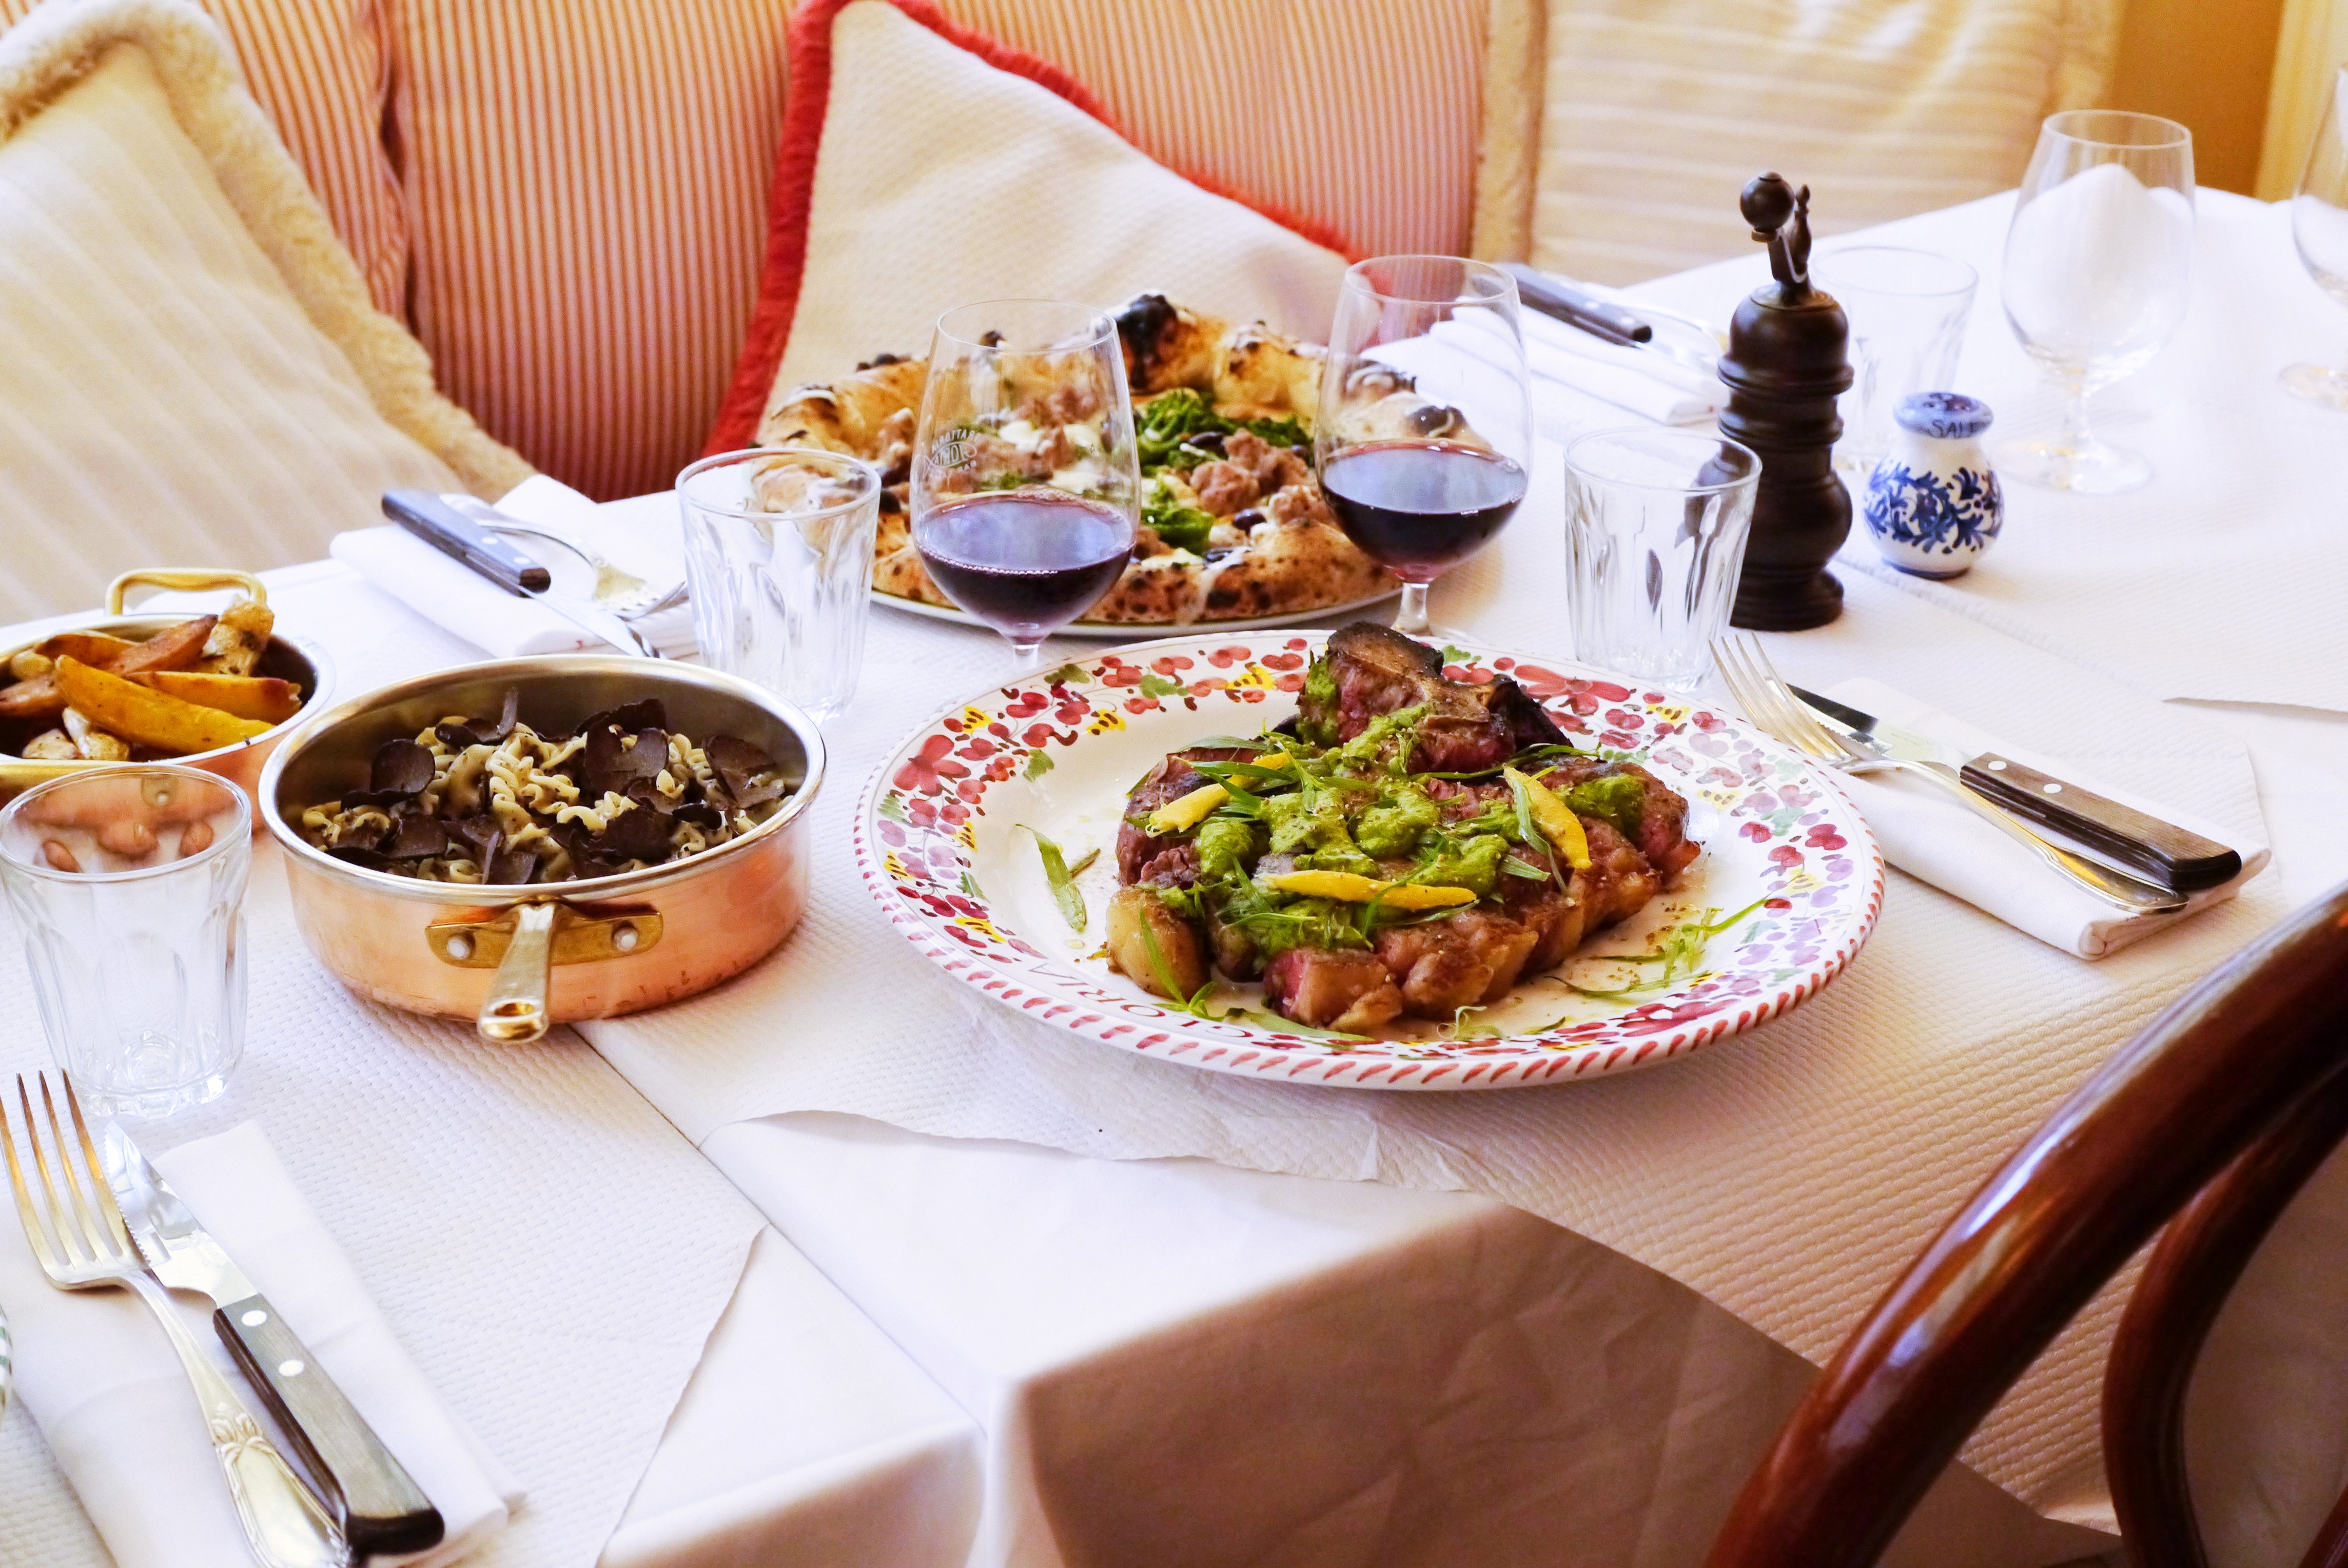 Wildly Extra Italian Restaurants Gloria and Circolo Popolare Plan Covent Garden Opening